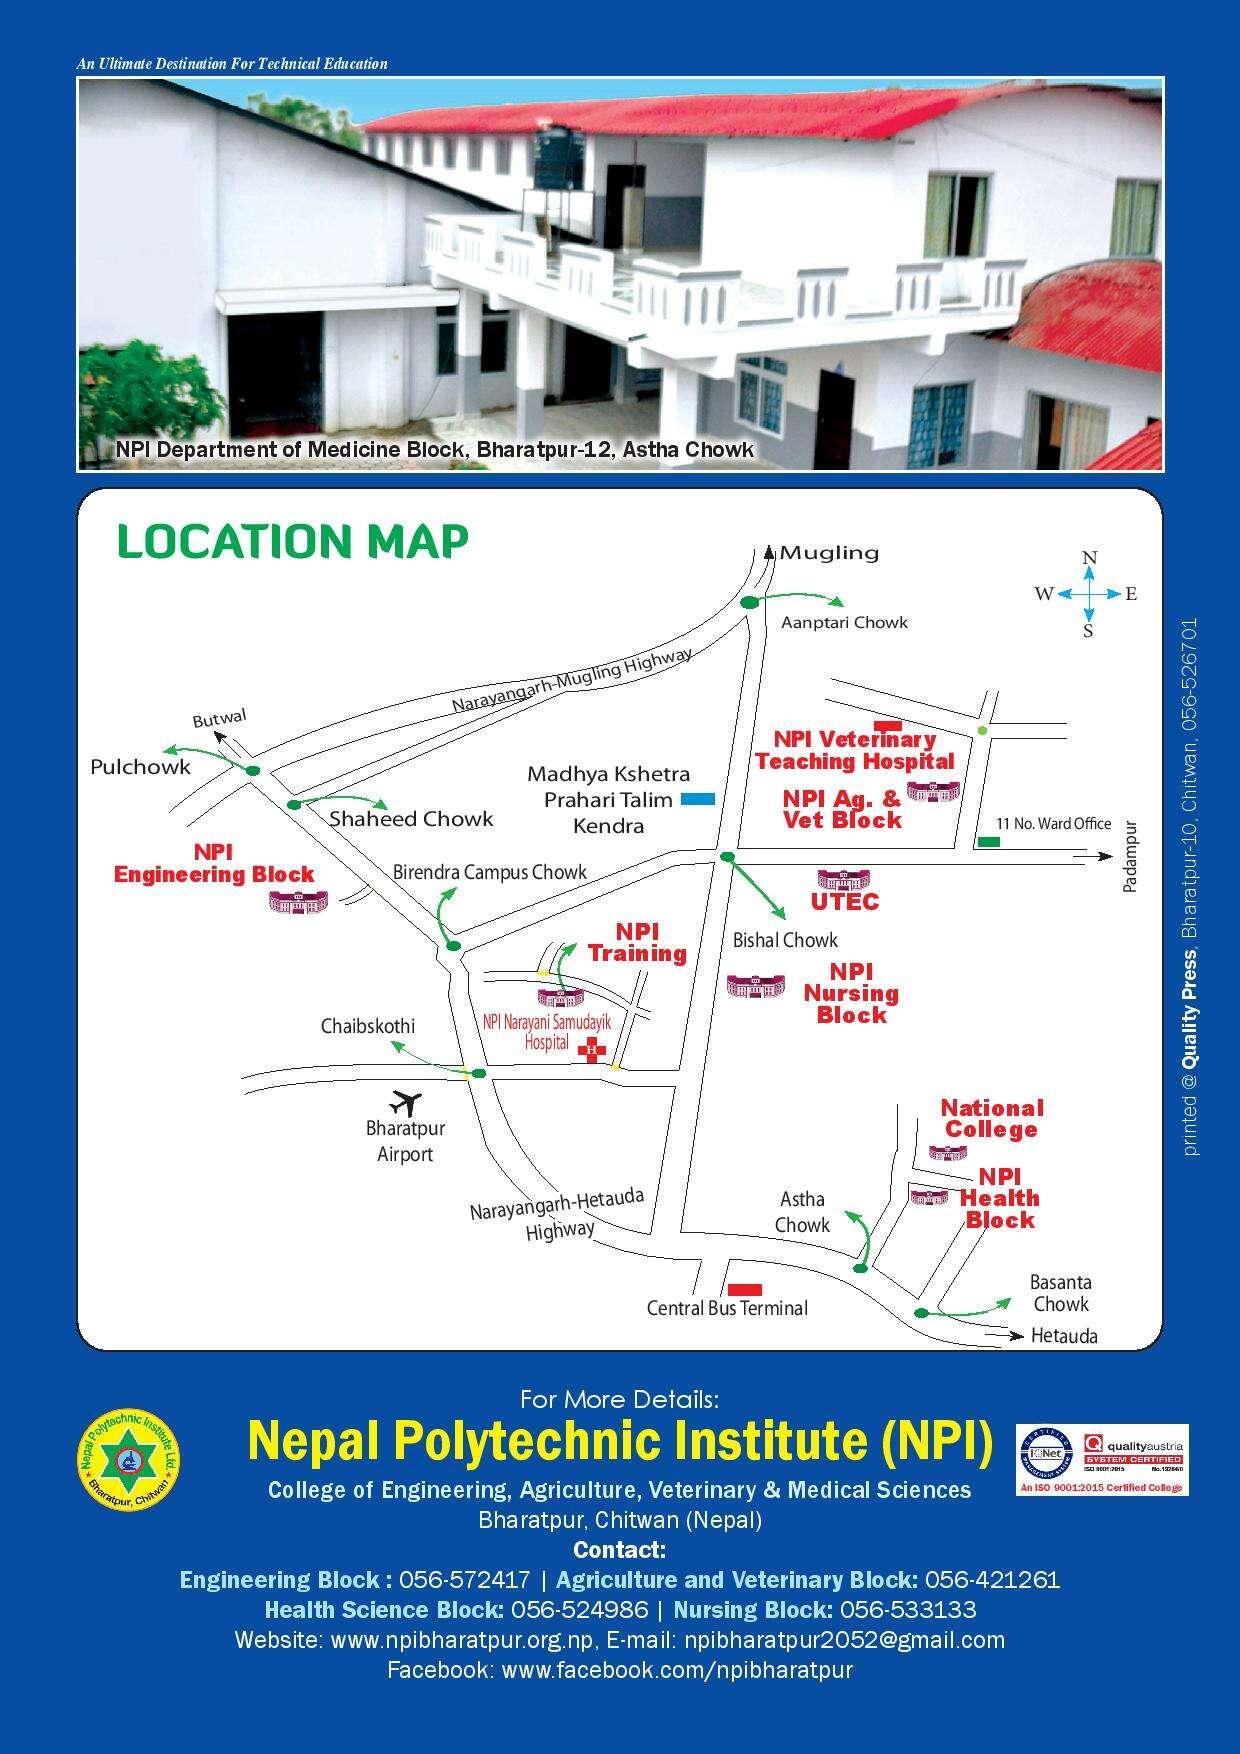 Nepal Polytechnic Institute